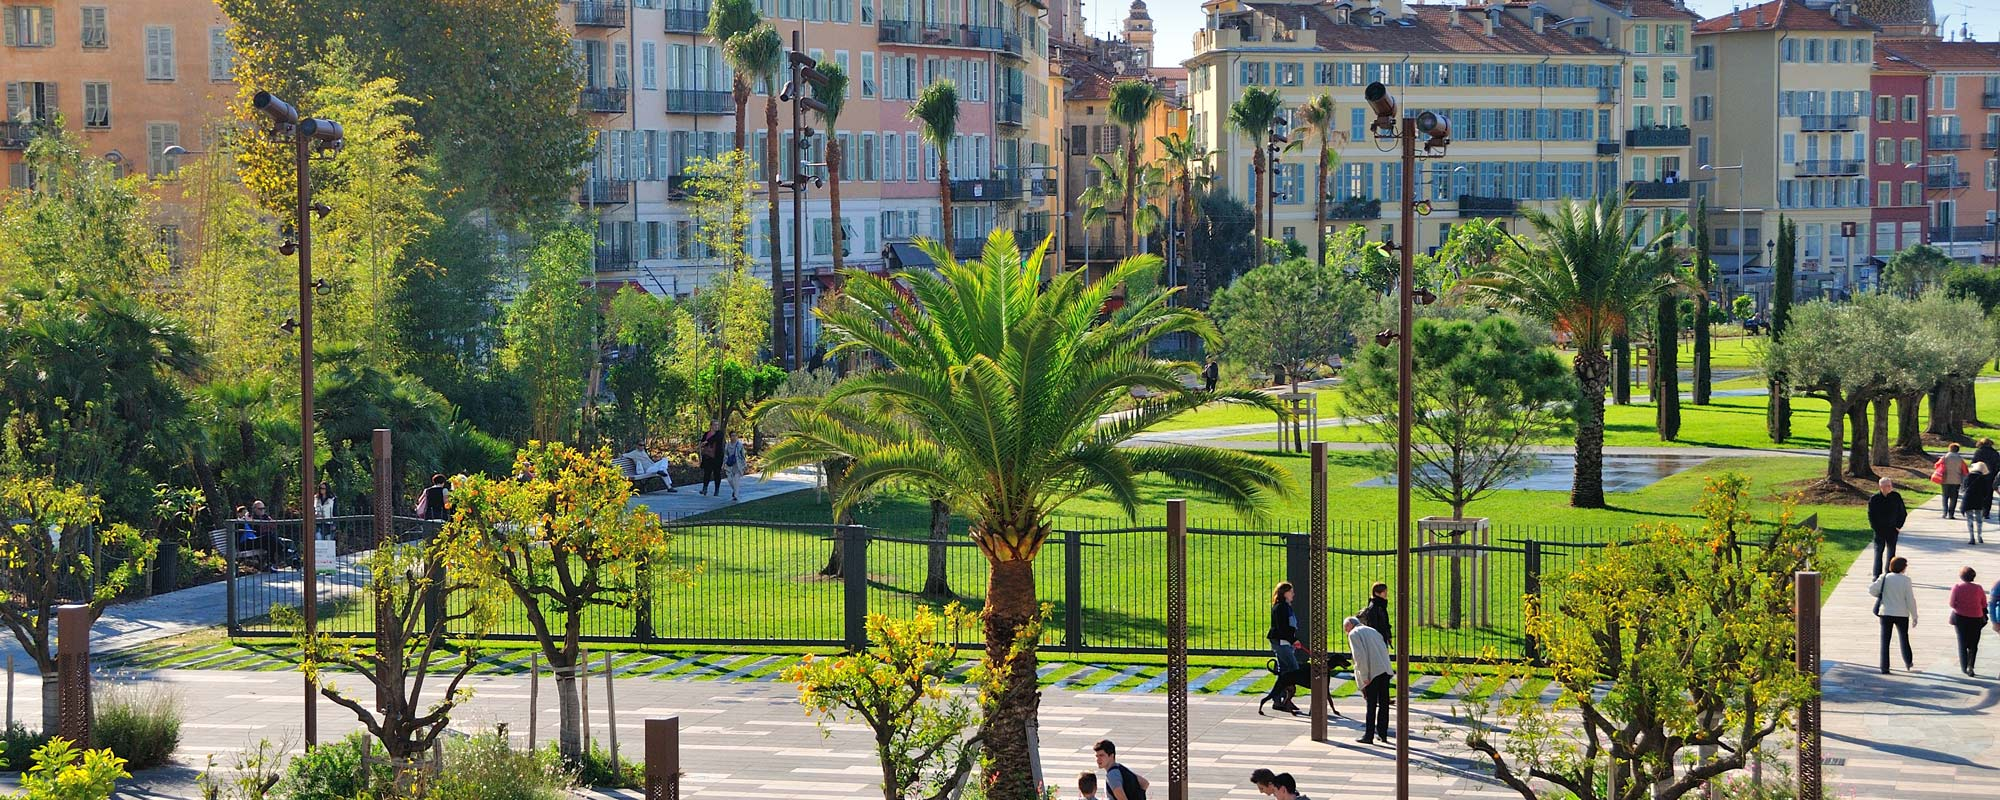 D_Nice_Promenade_Paillon_02